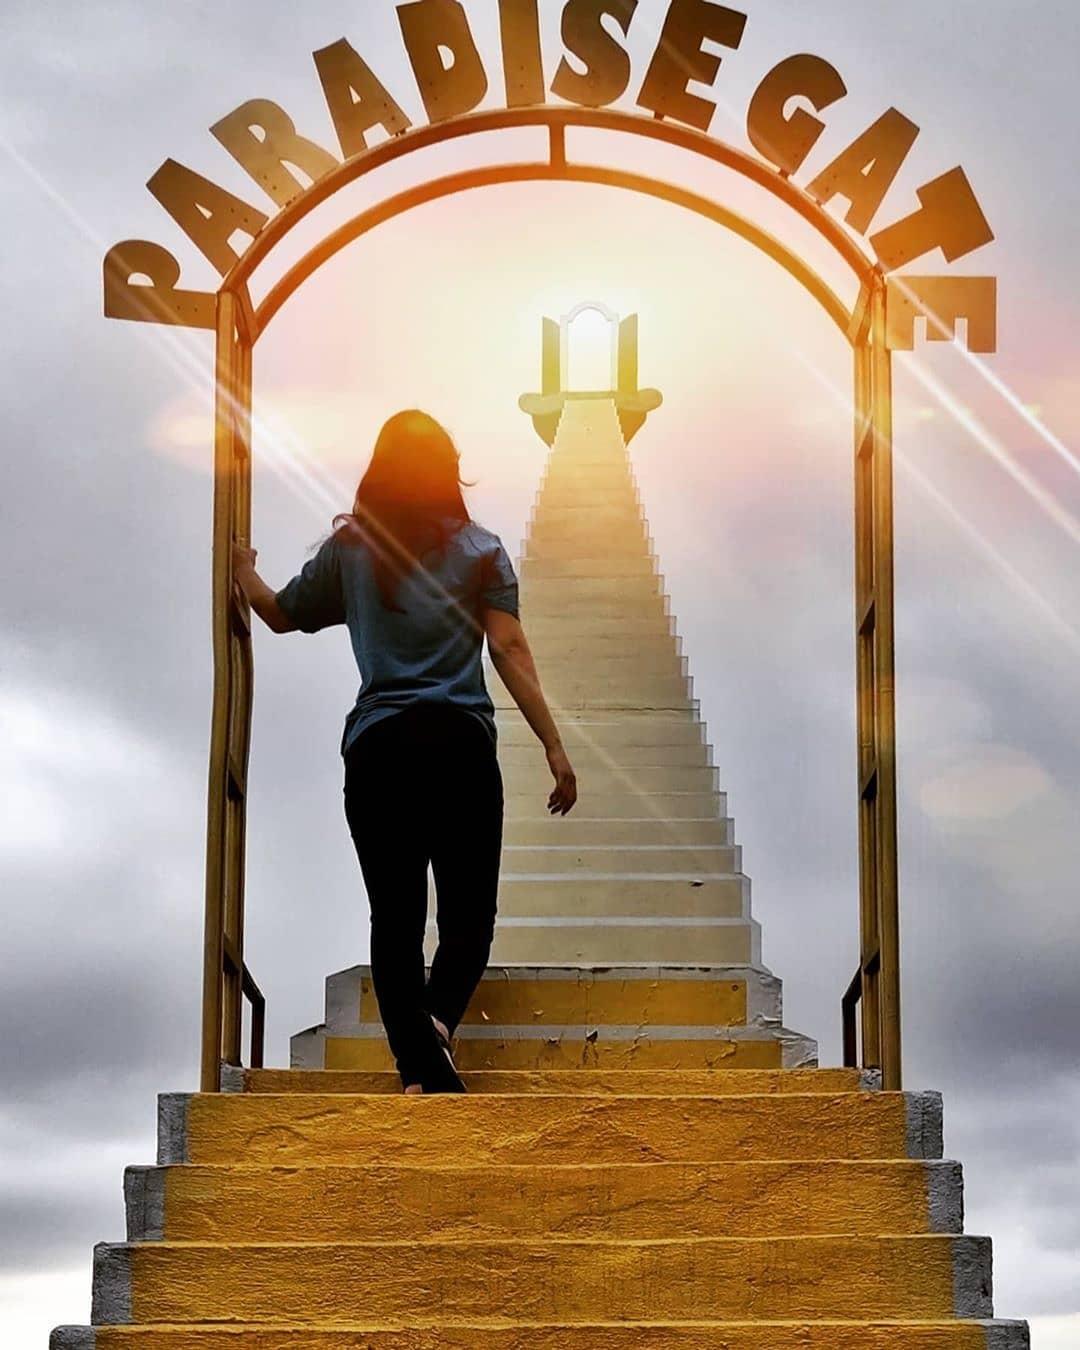 paradise gate the lost world jogja